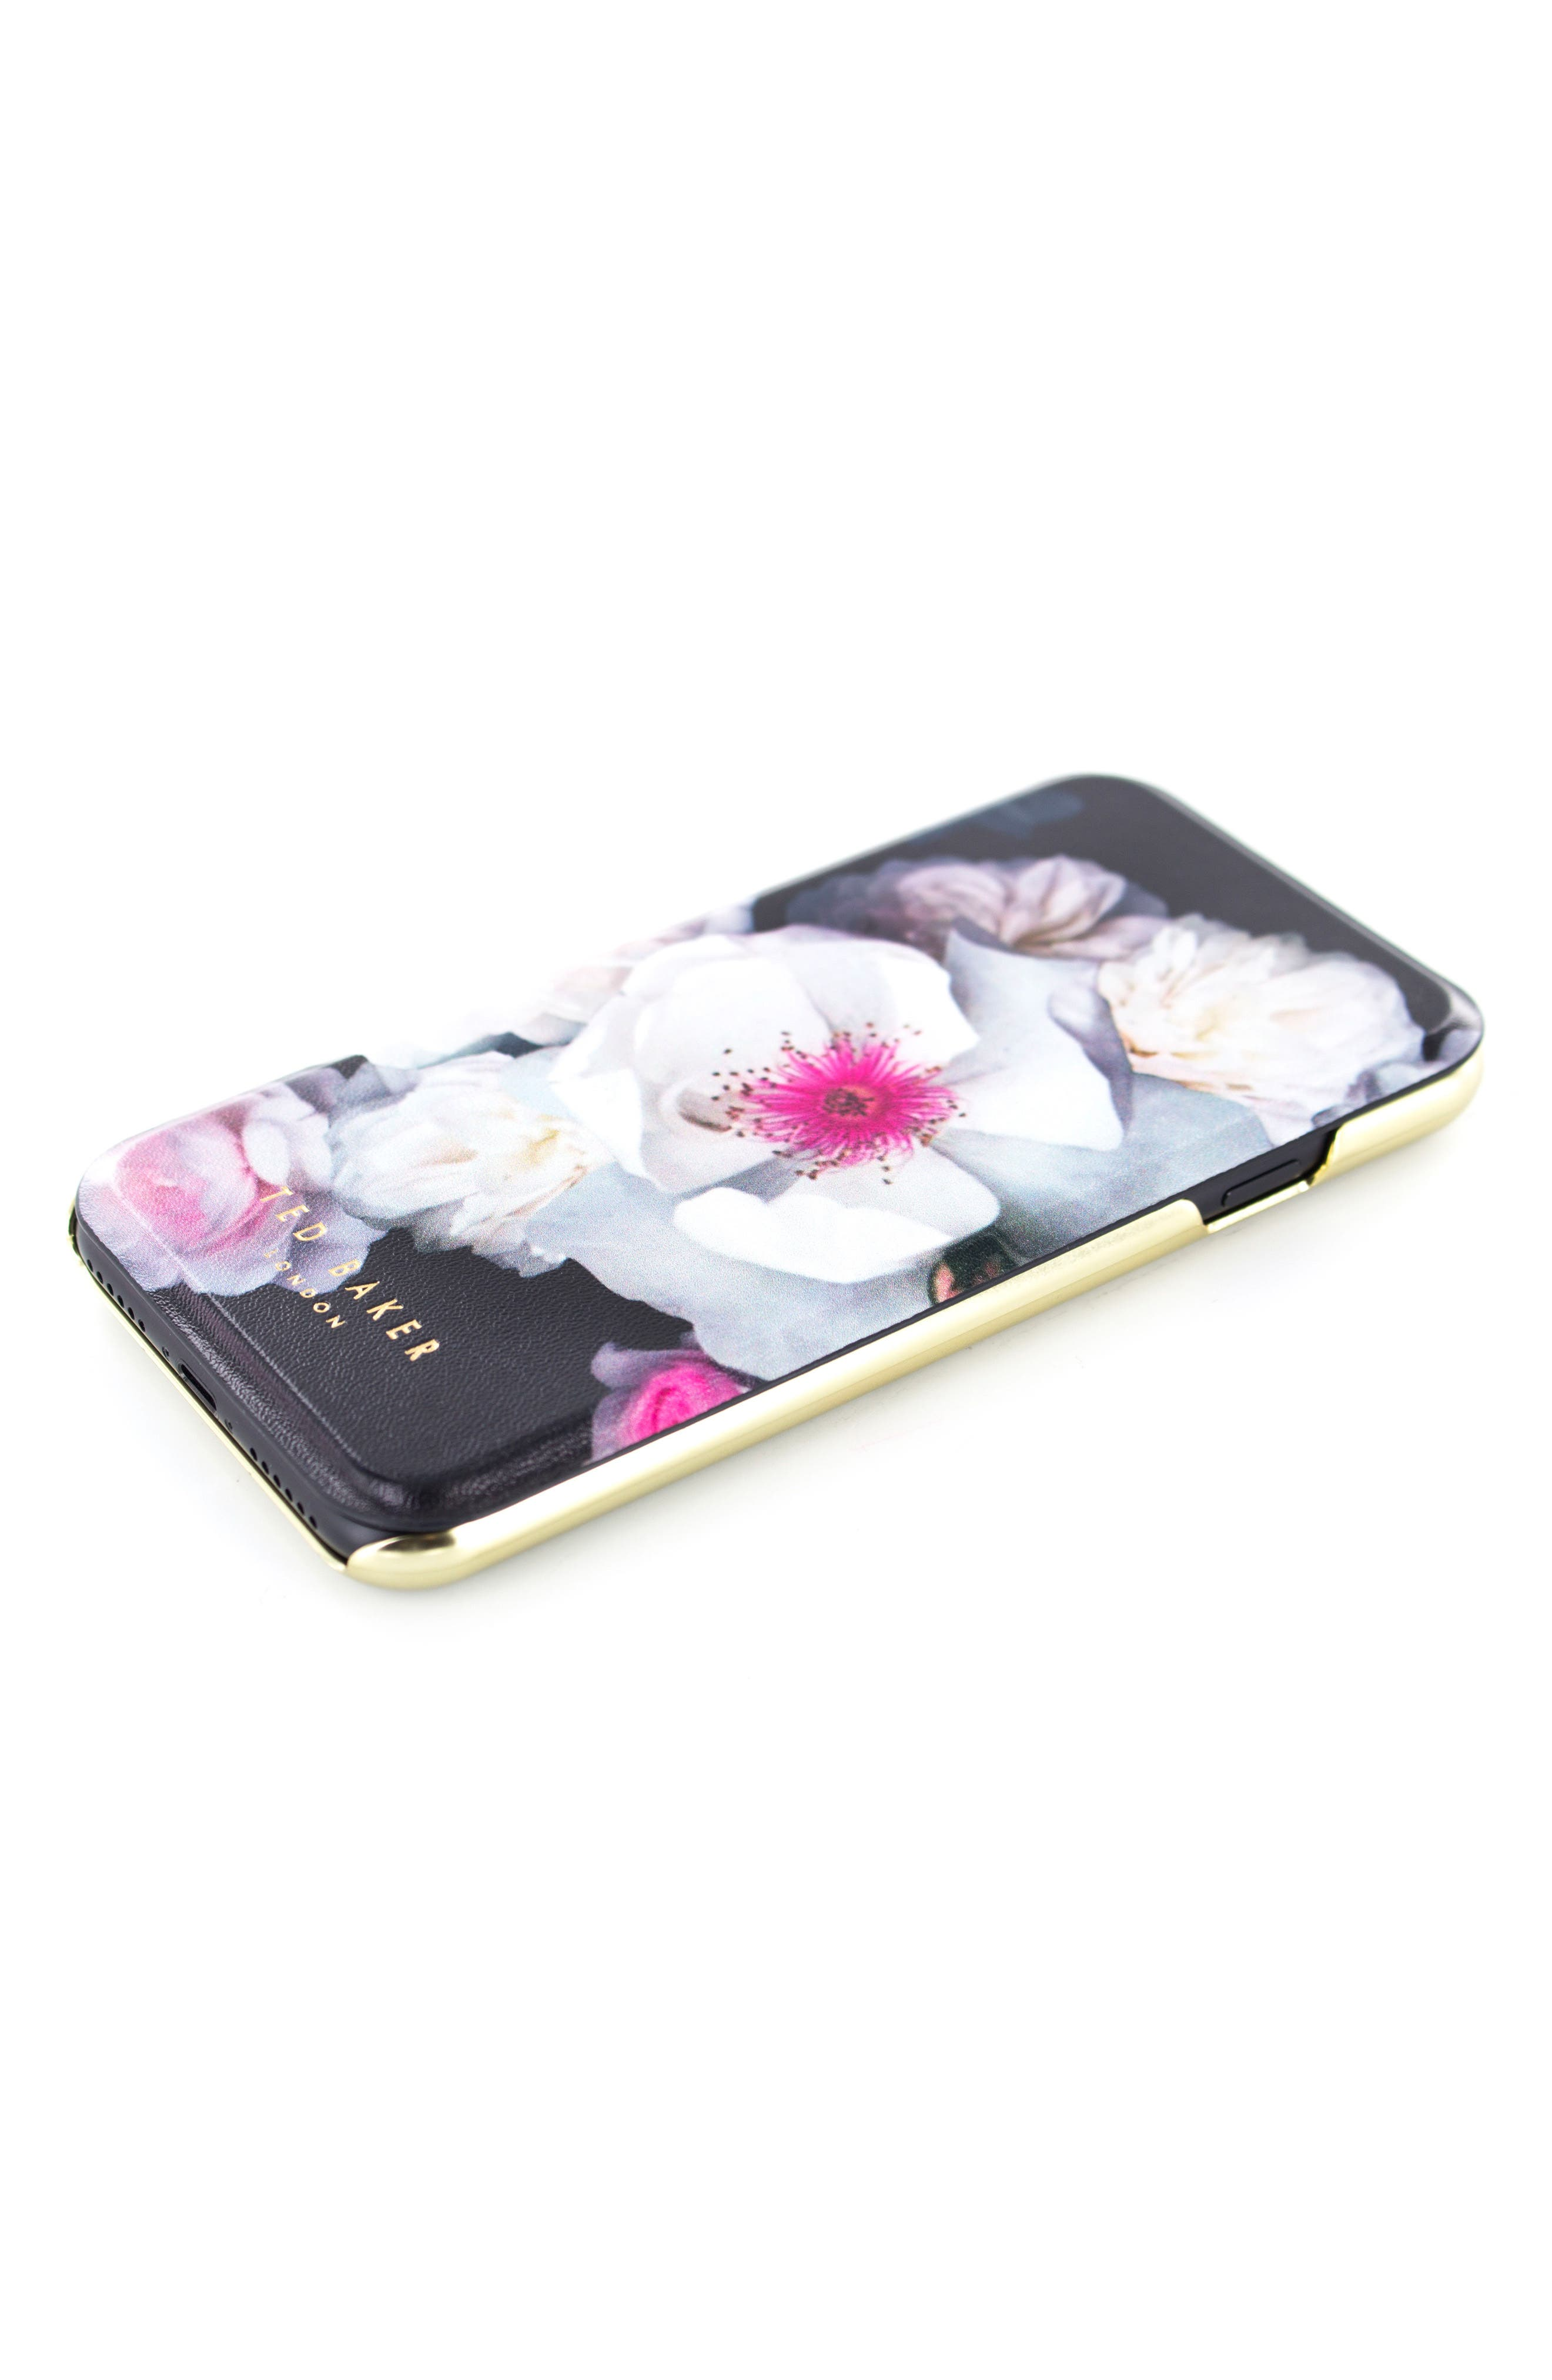 Ted Baker London Chelsea iPhone 7/8 & 7/8 Plus Mirror Folio Case